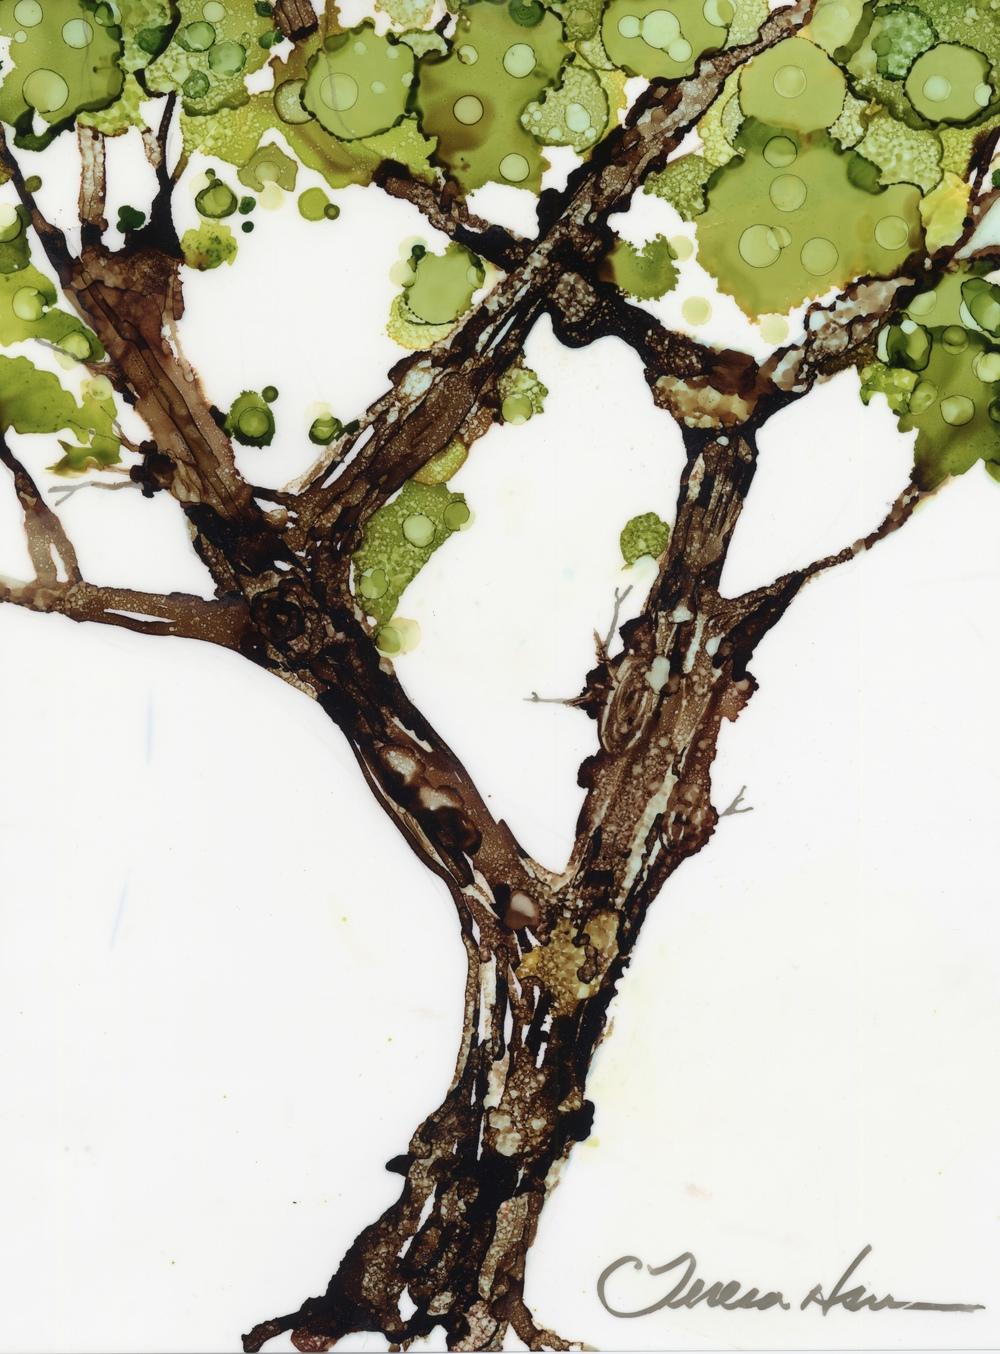 TreeSM.jpg